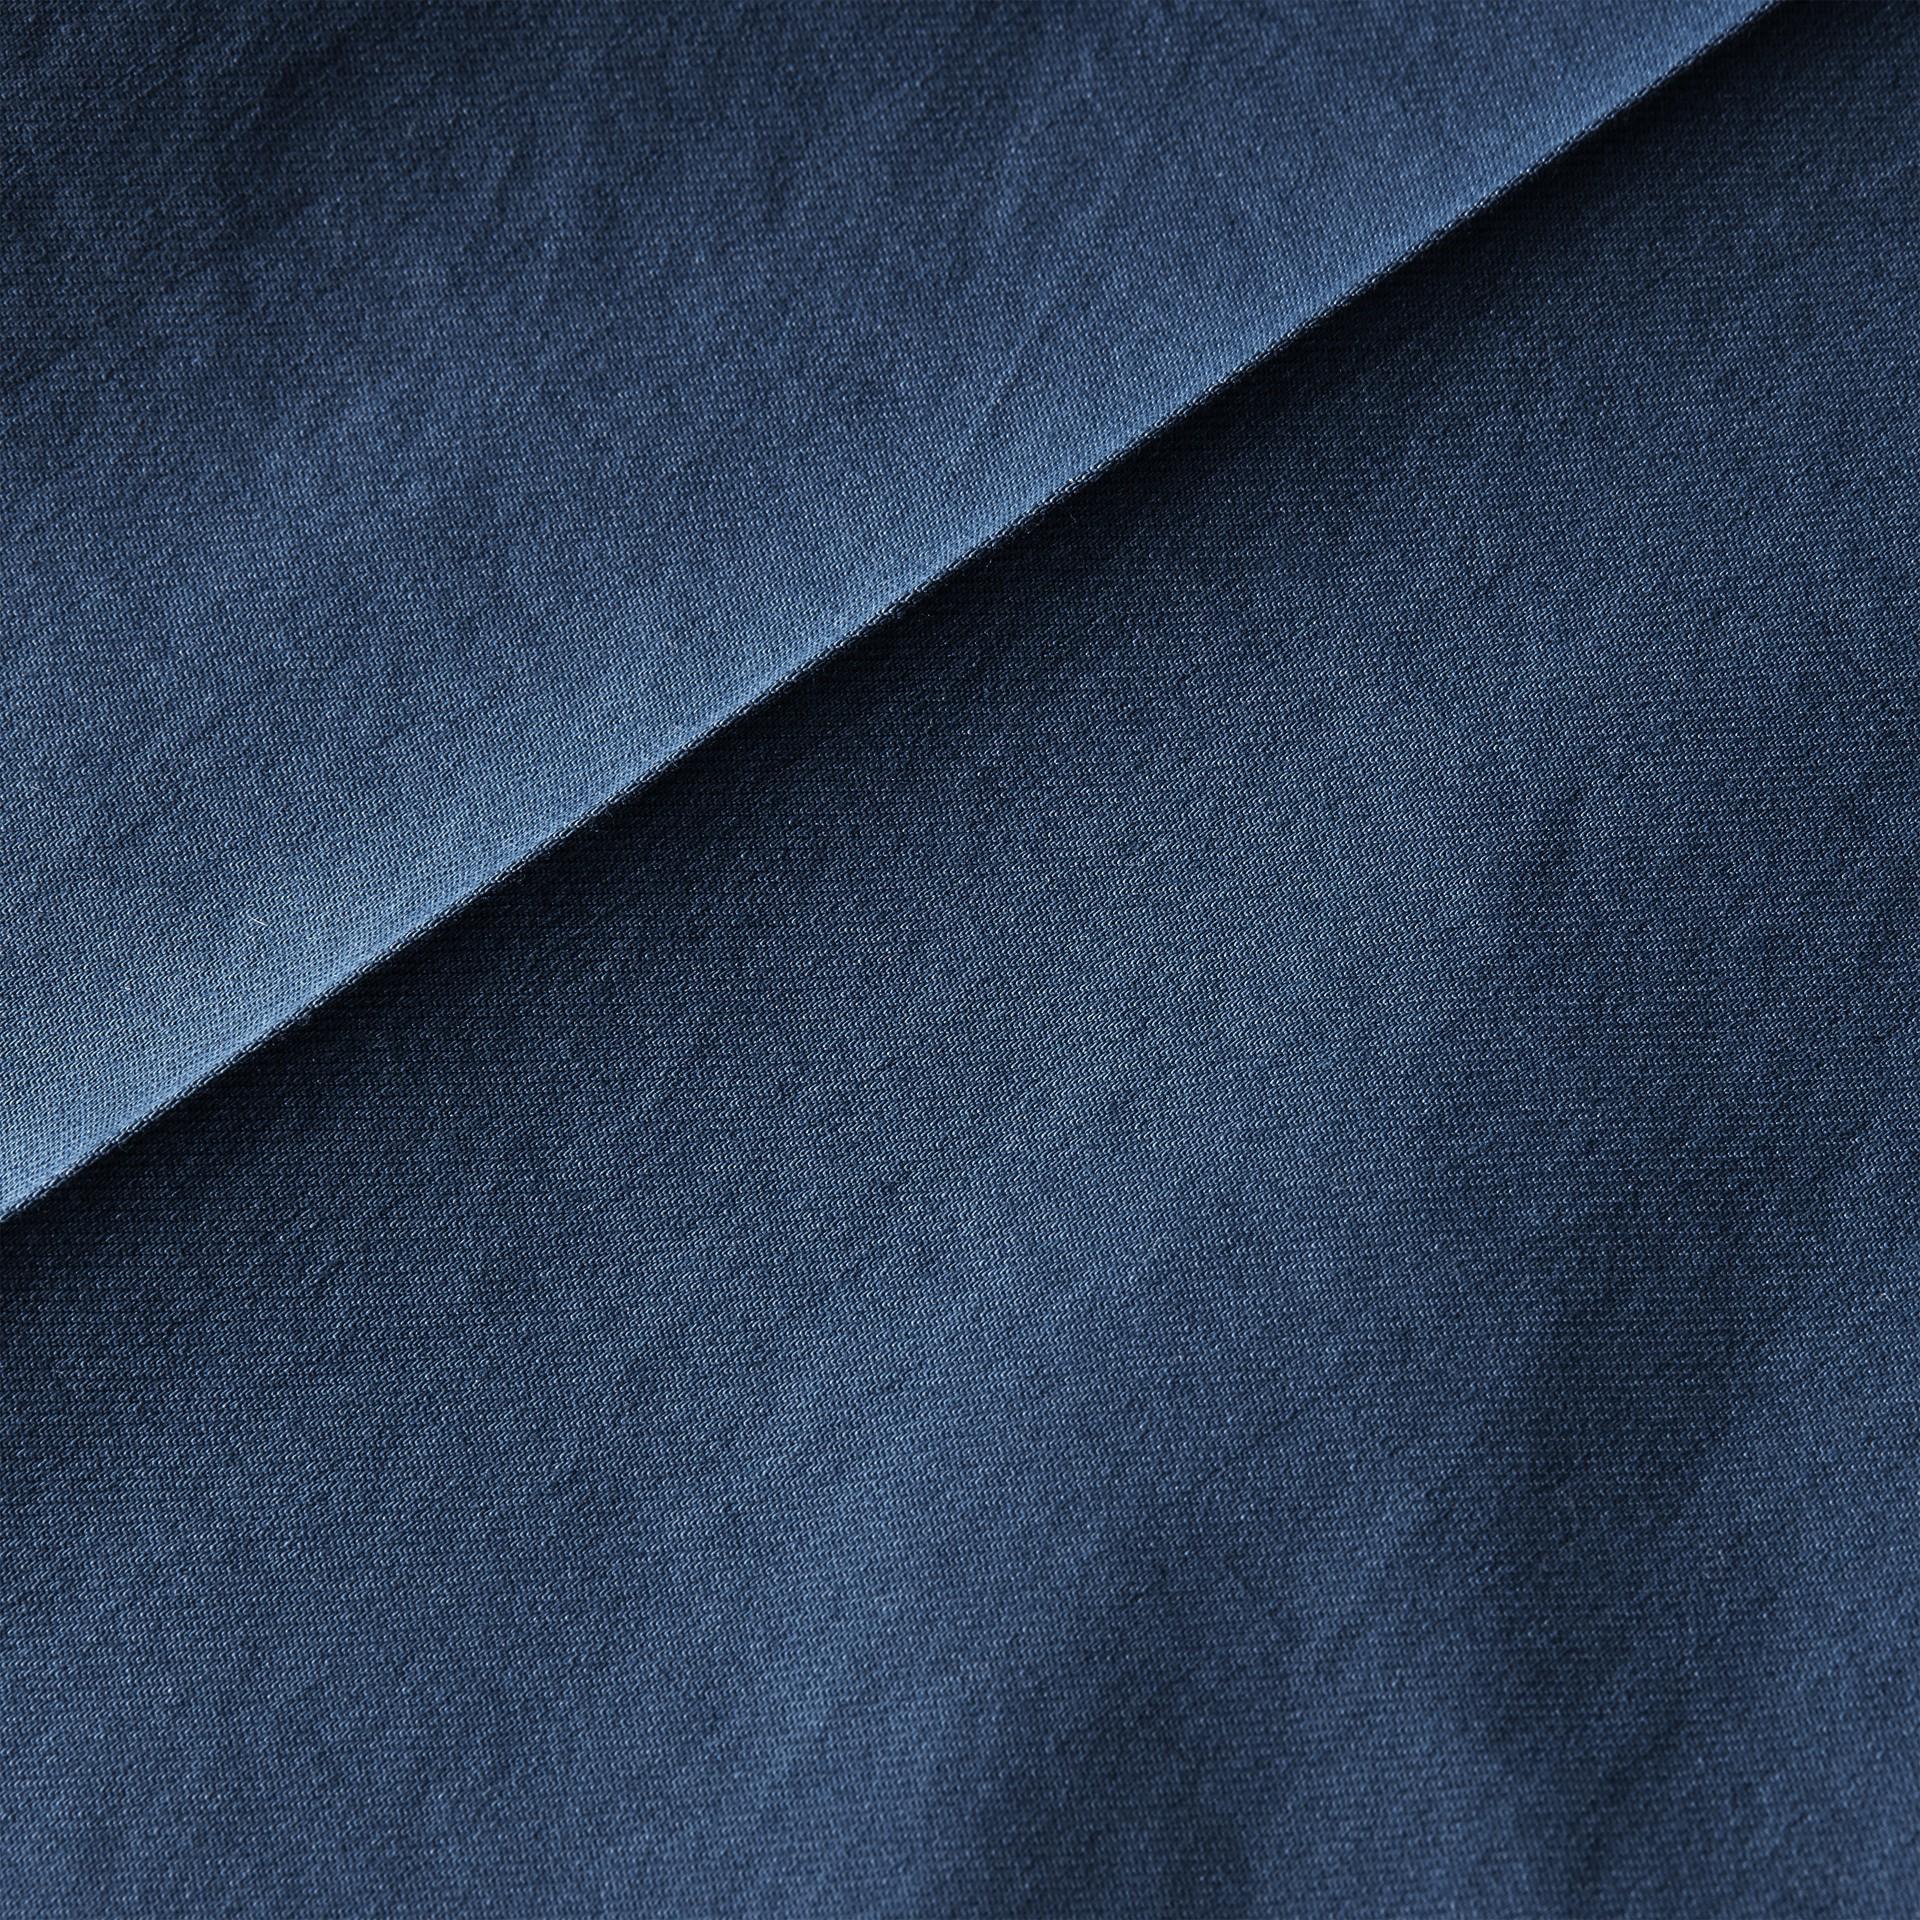 Bleu acier vif Pantalon slim en coton extensible Bleu Acier Vif - photo de la galerie 2